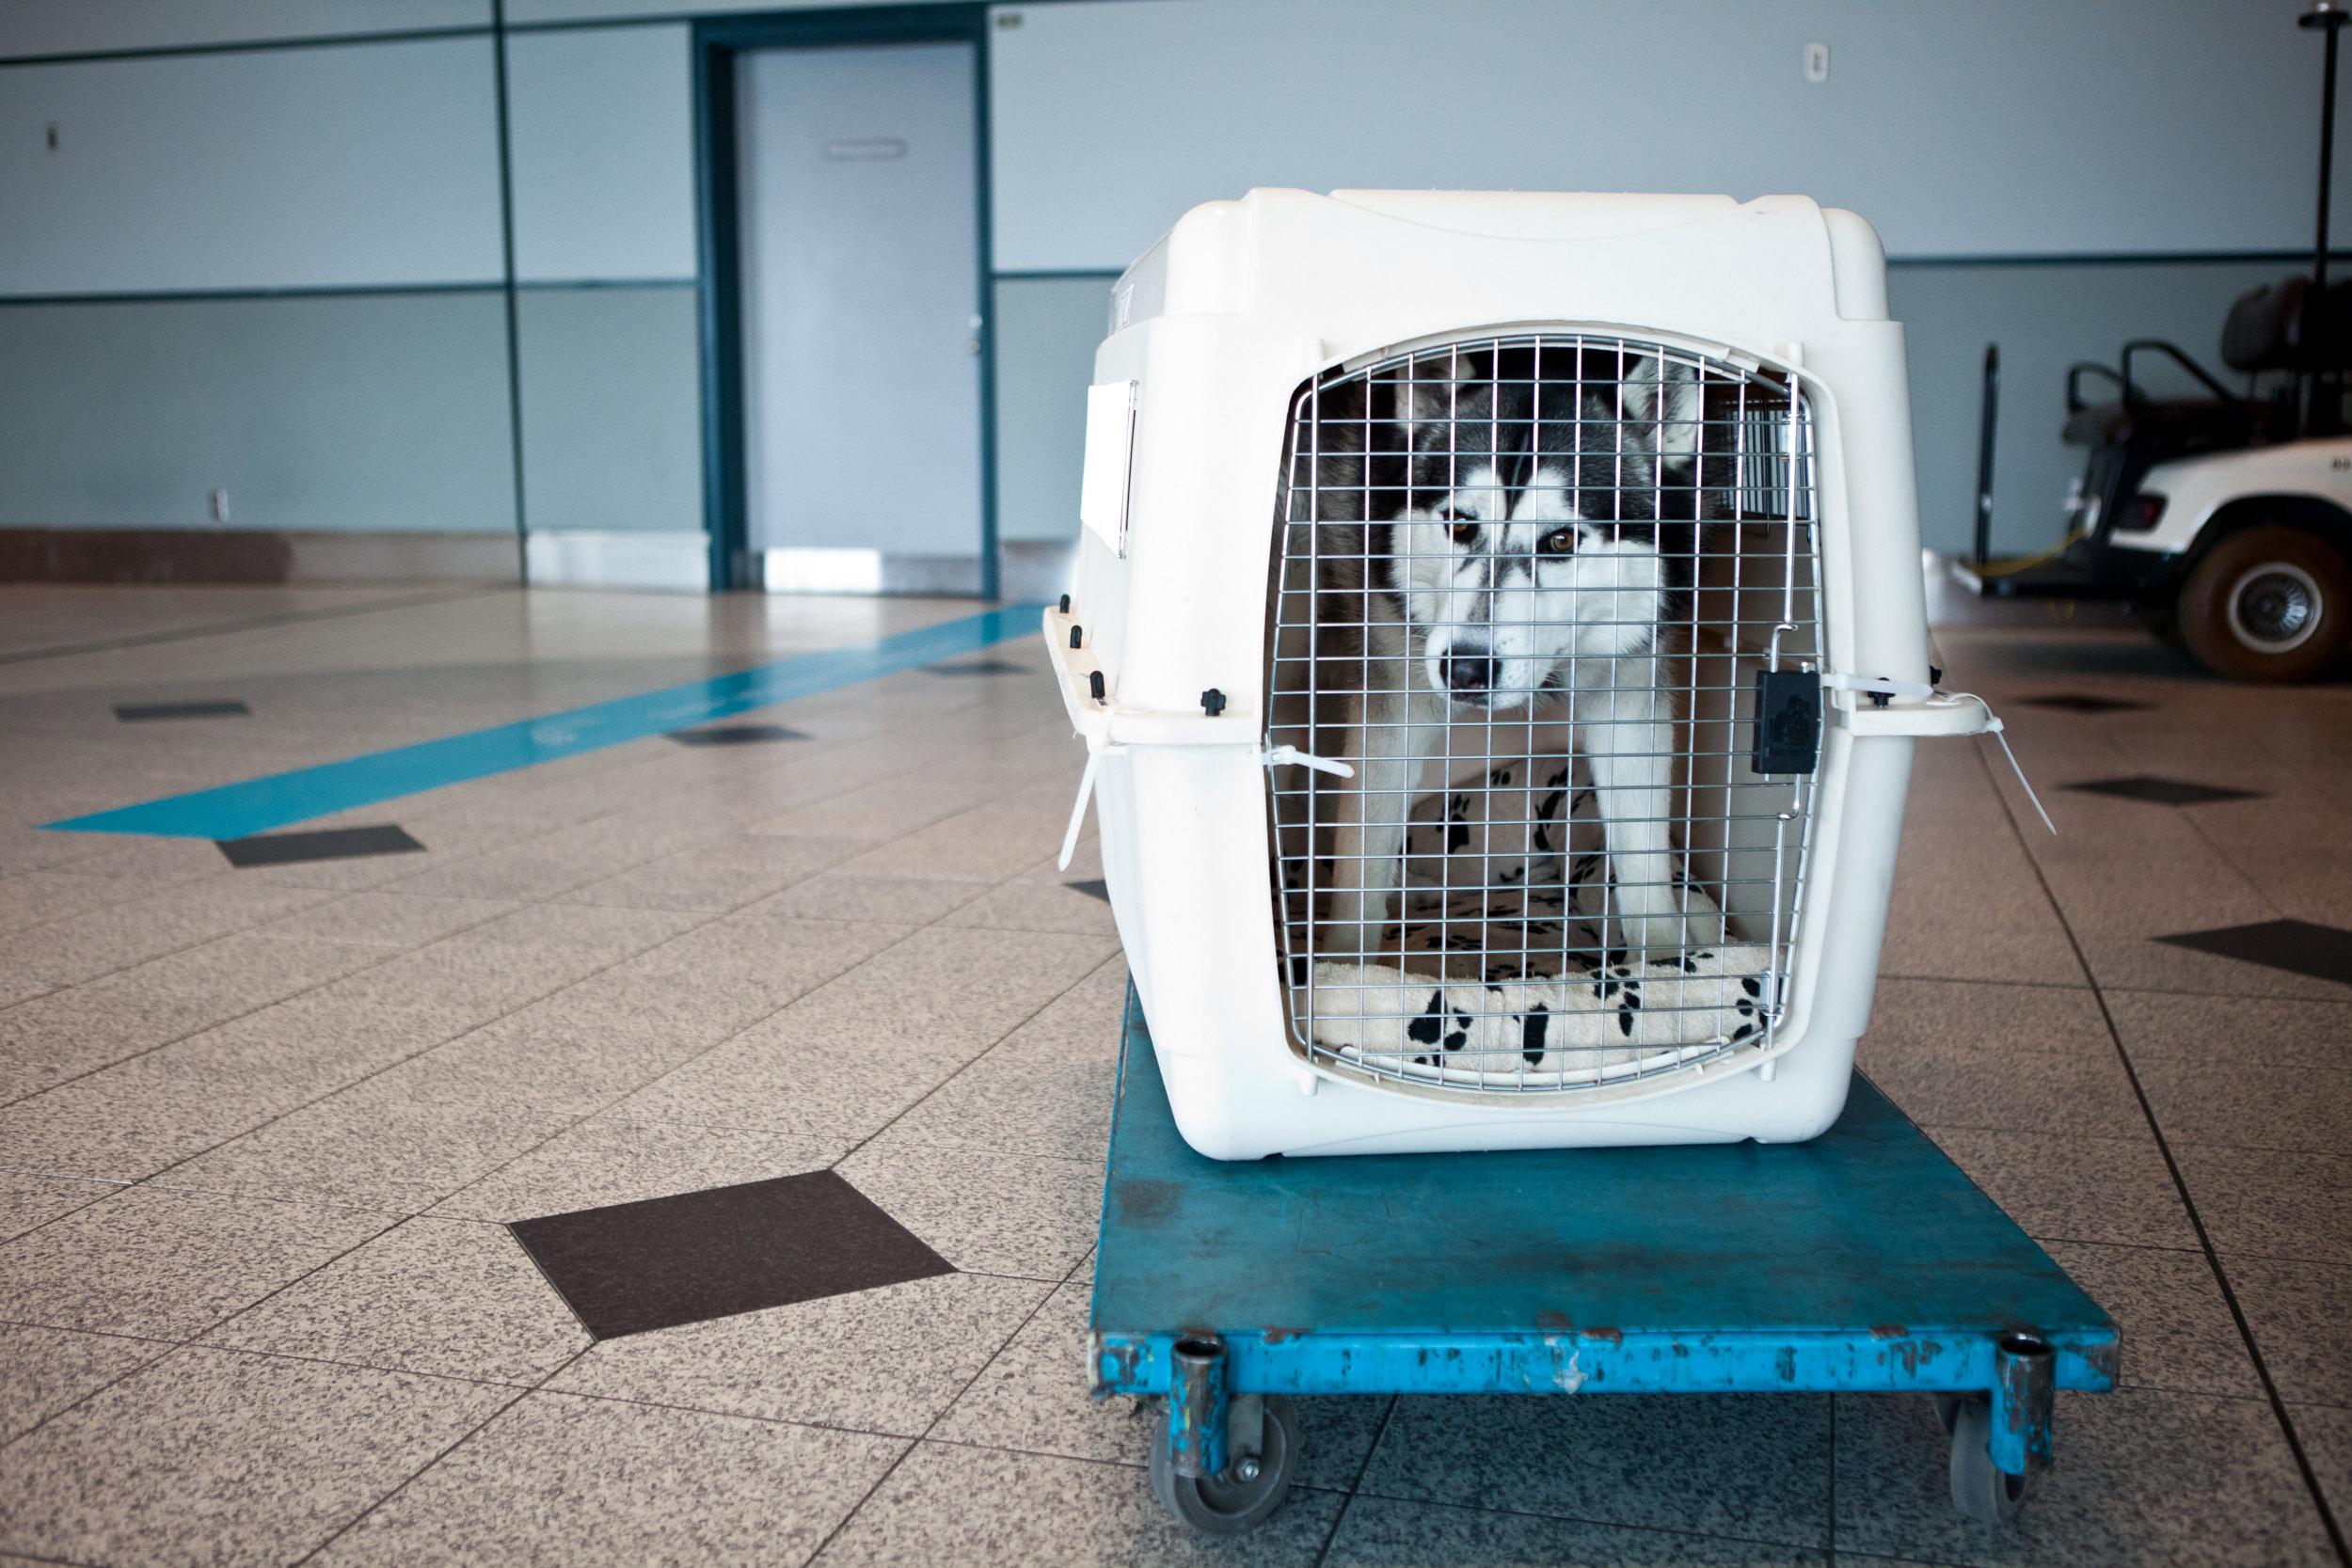 shlomi-amiga-dogs-in-cages-2.jpg